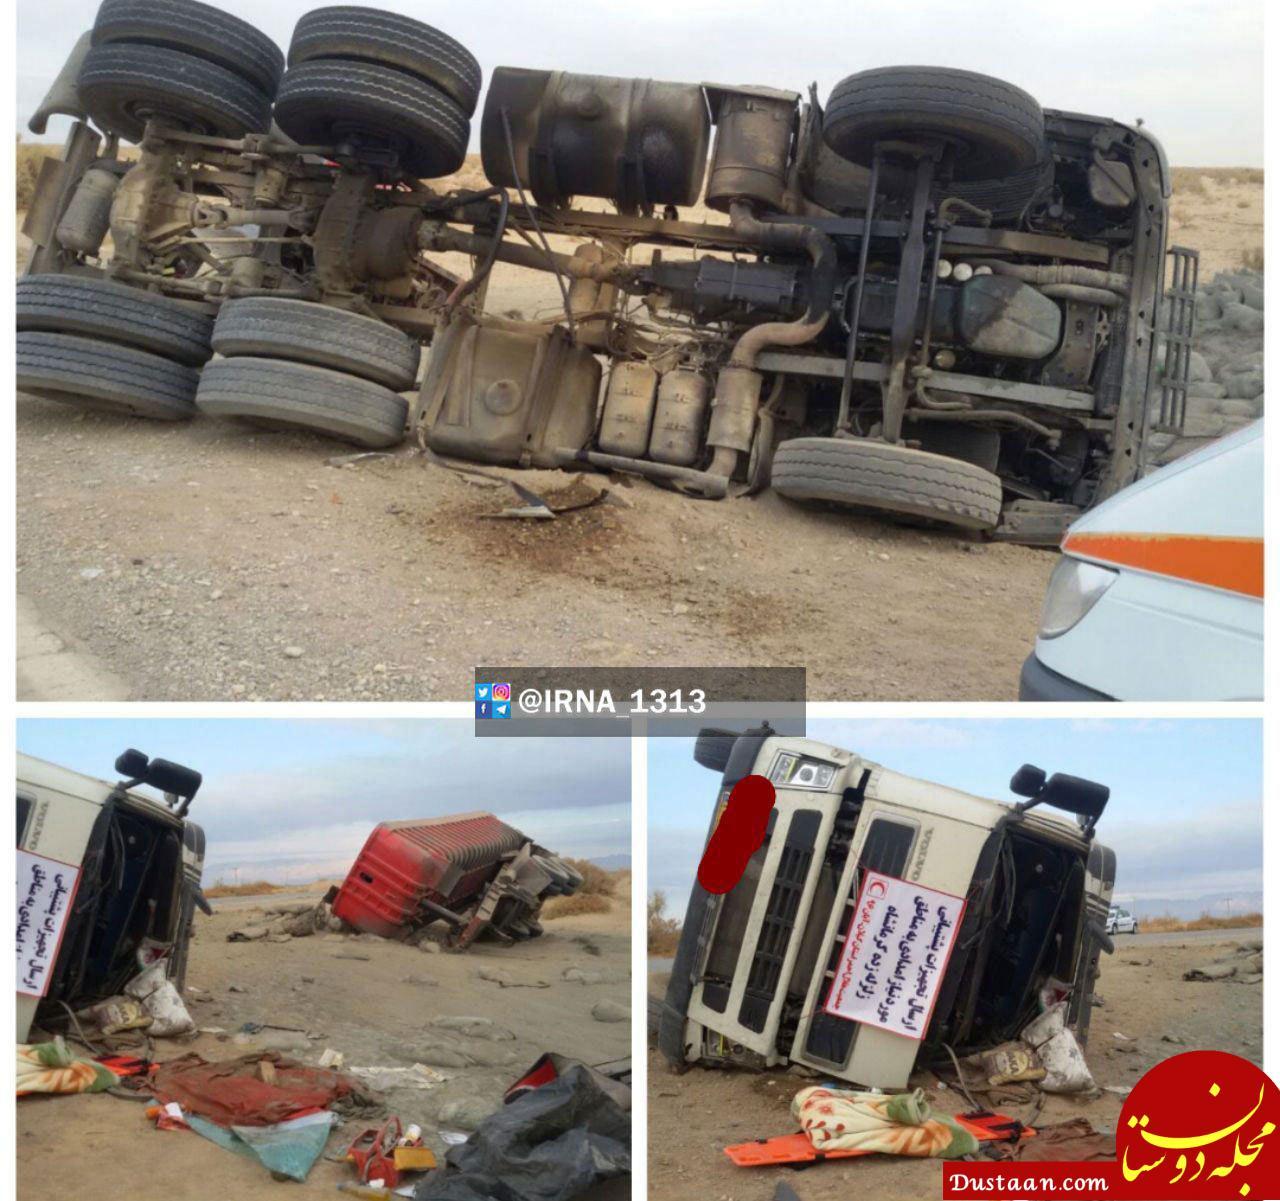 www.dustaan.com واژگونی تریلی حامل کمک های مردمی به زلزله زدگان +عکس